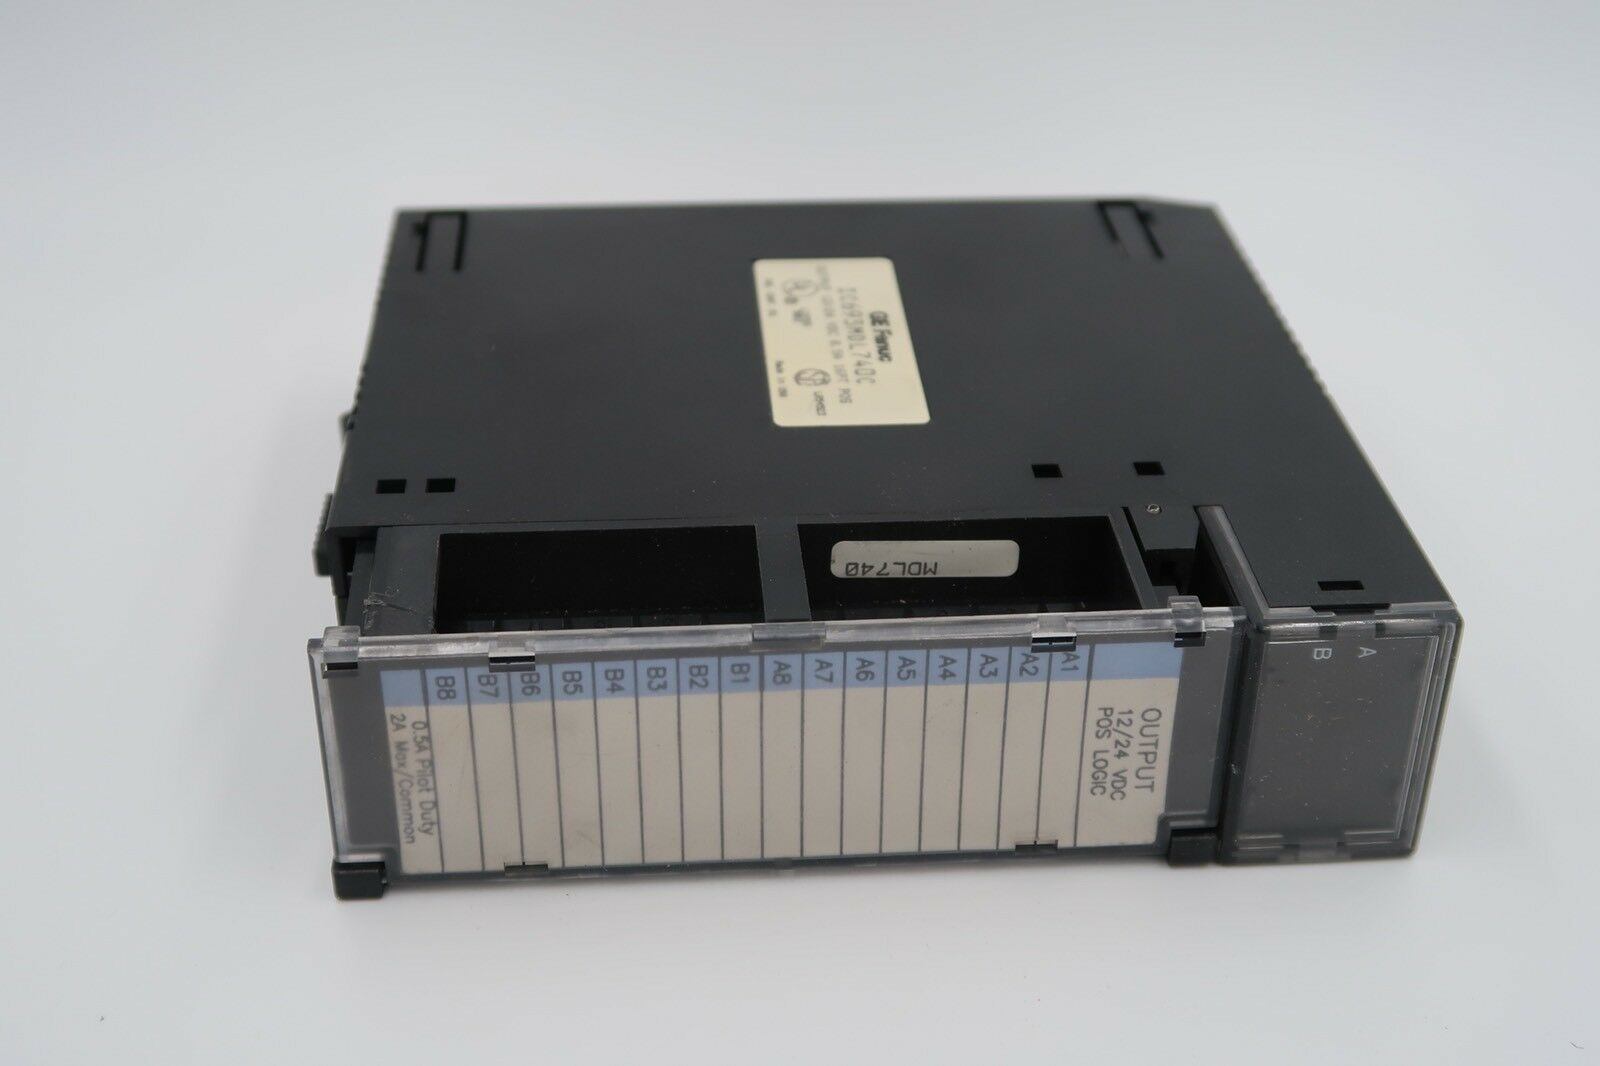 GE Fanuc IC693MDL740C Output 12 24 VDC 0.5A 16PT POS Module